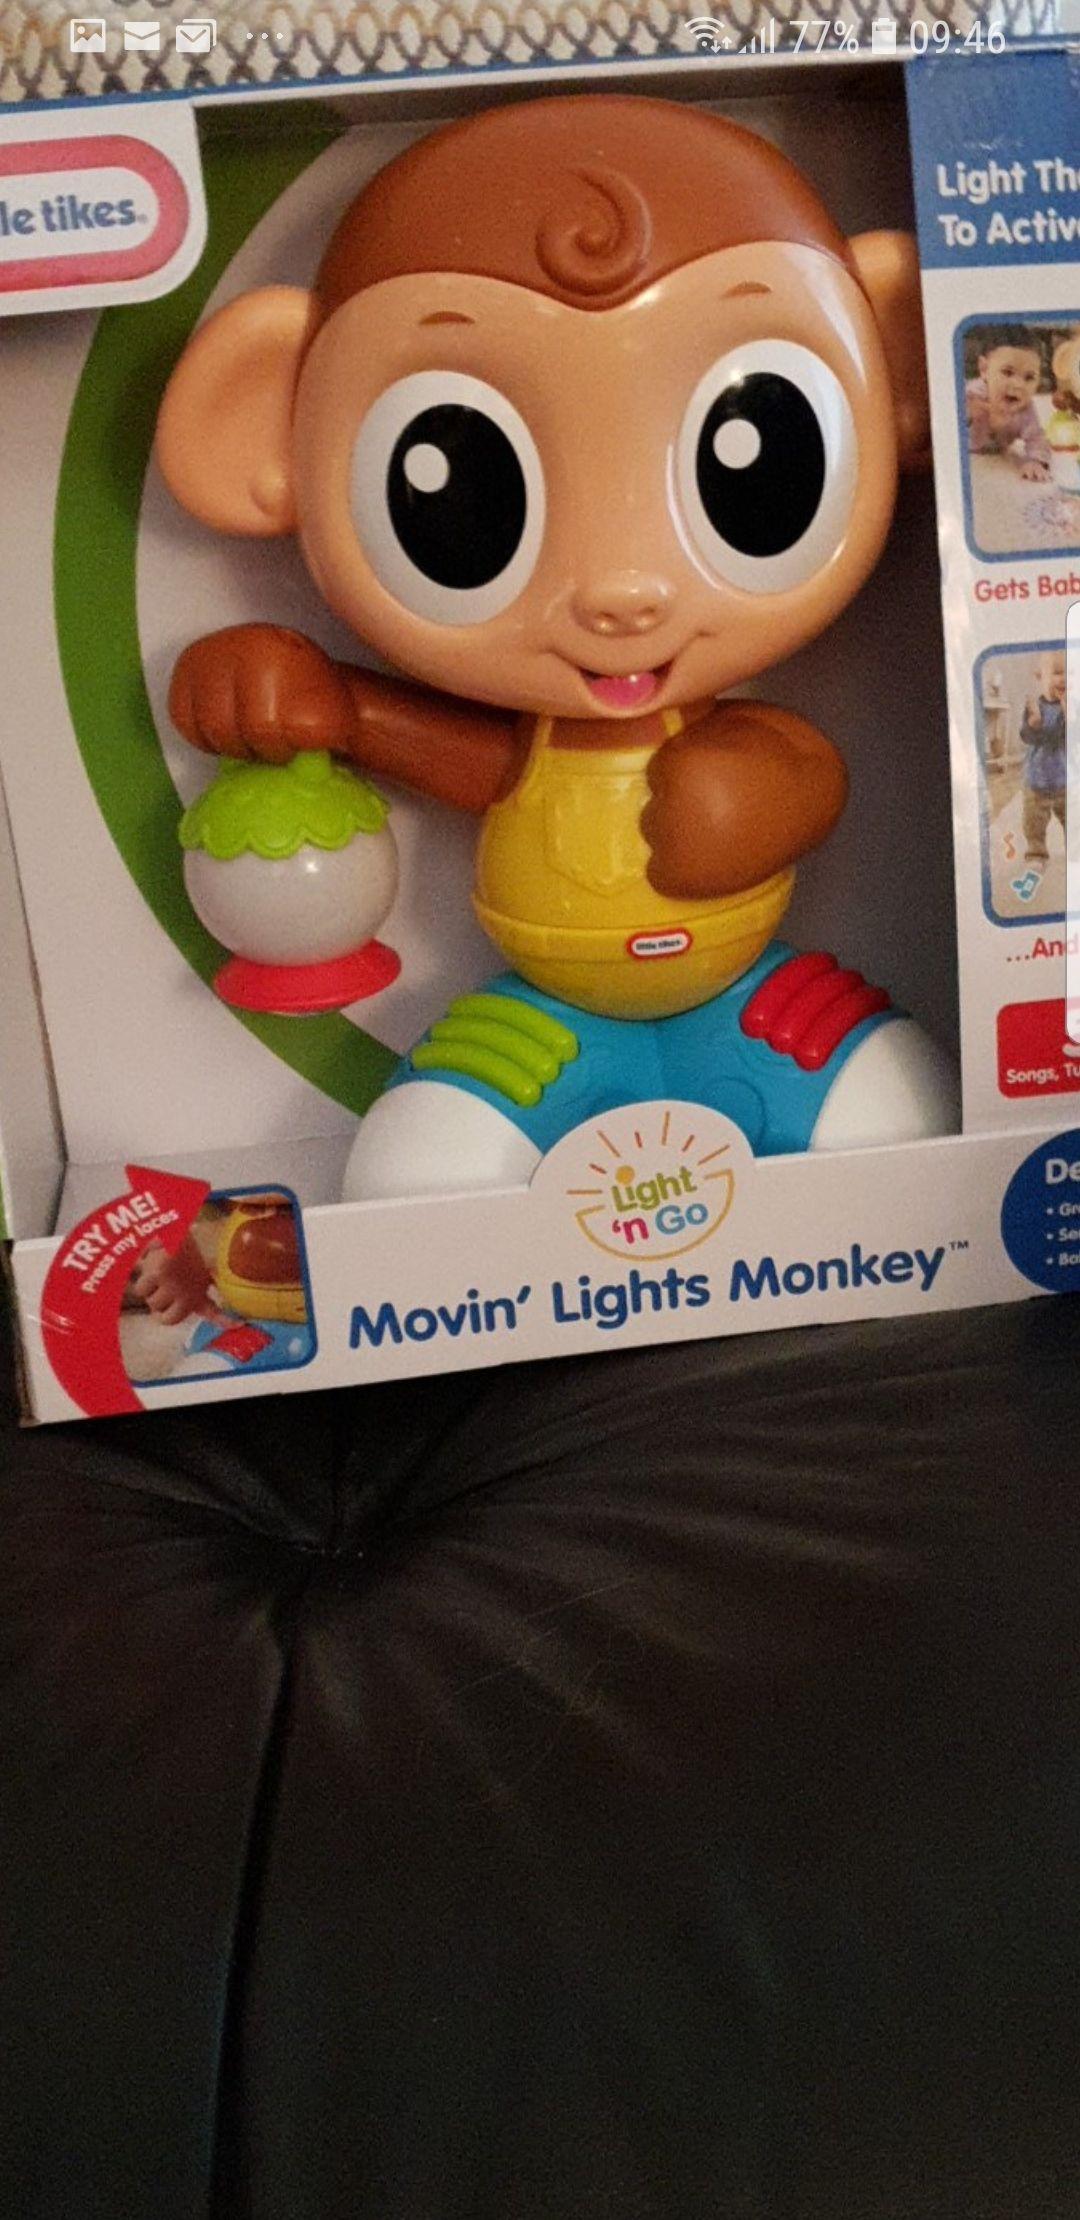 Little tikes movin lights monkey £15 online / instore @ Tesco